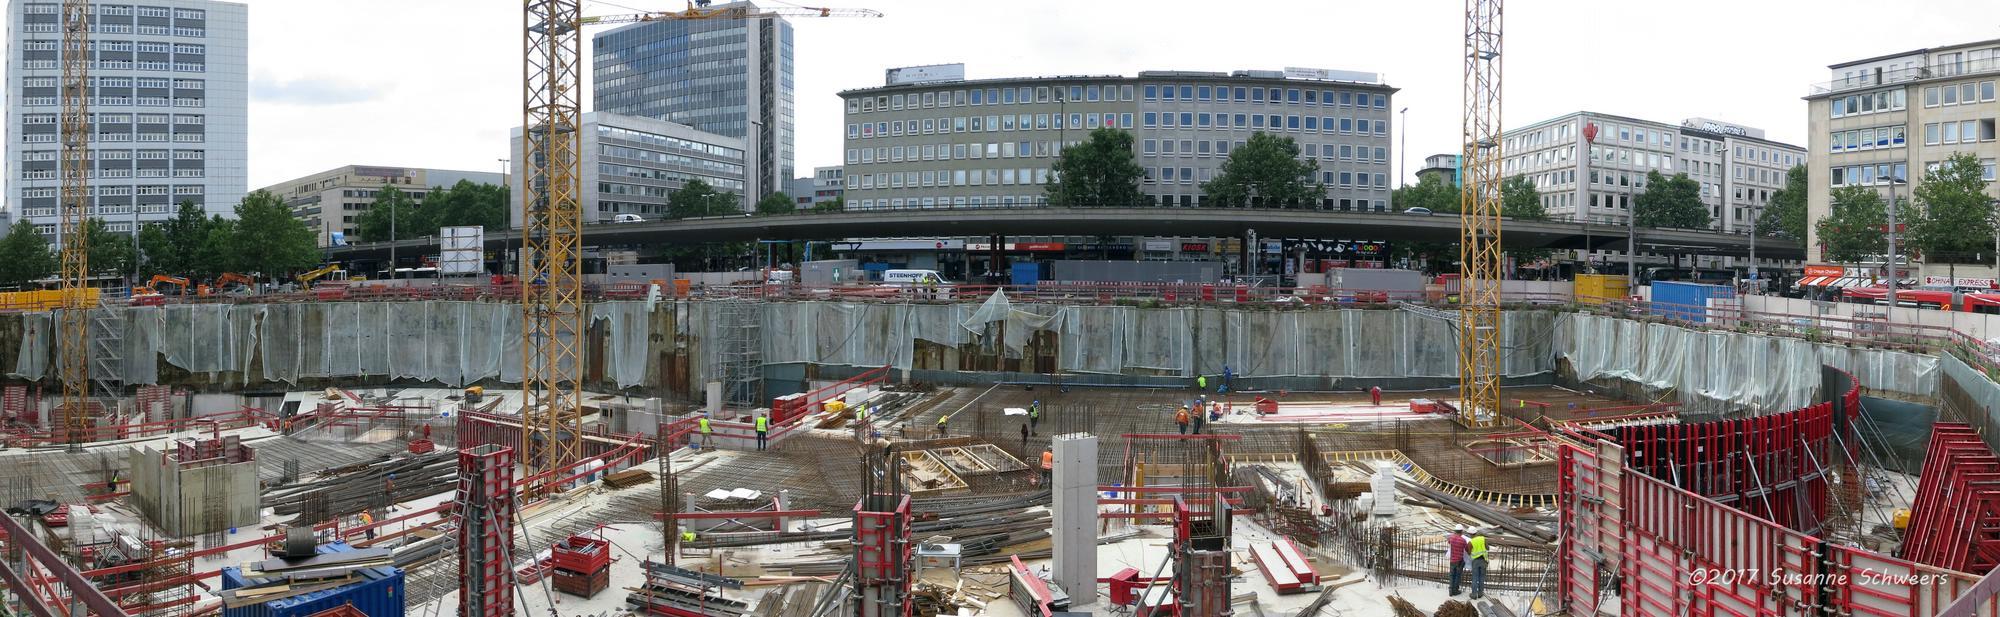 Baustelle Bahnhofsplatz 146